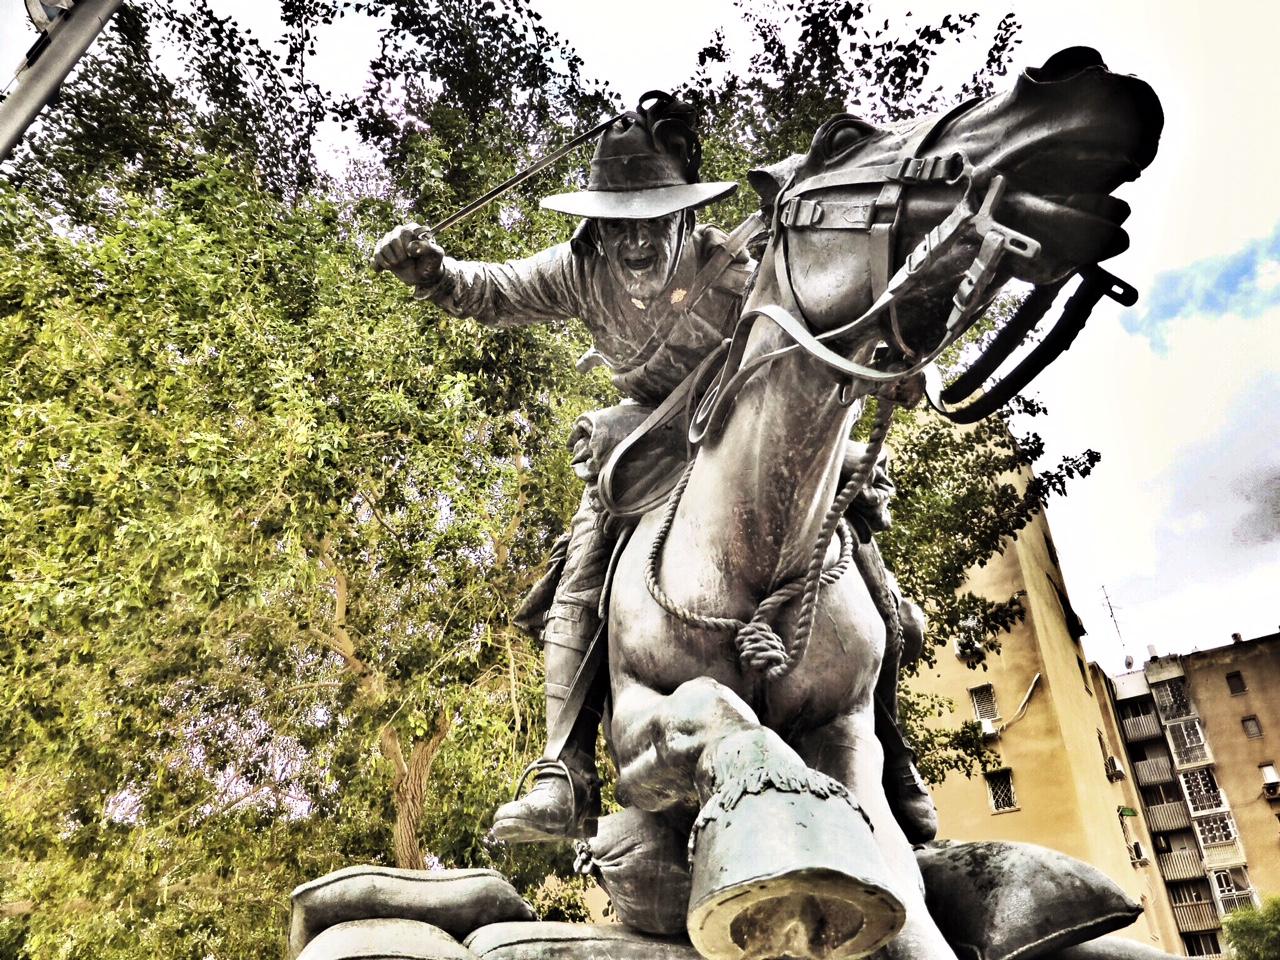 Lighthorse Monument, Beersheba